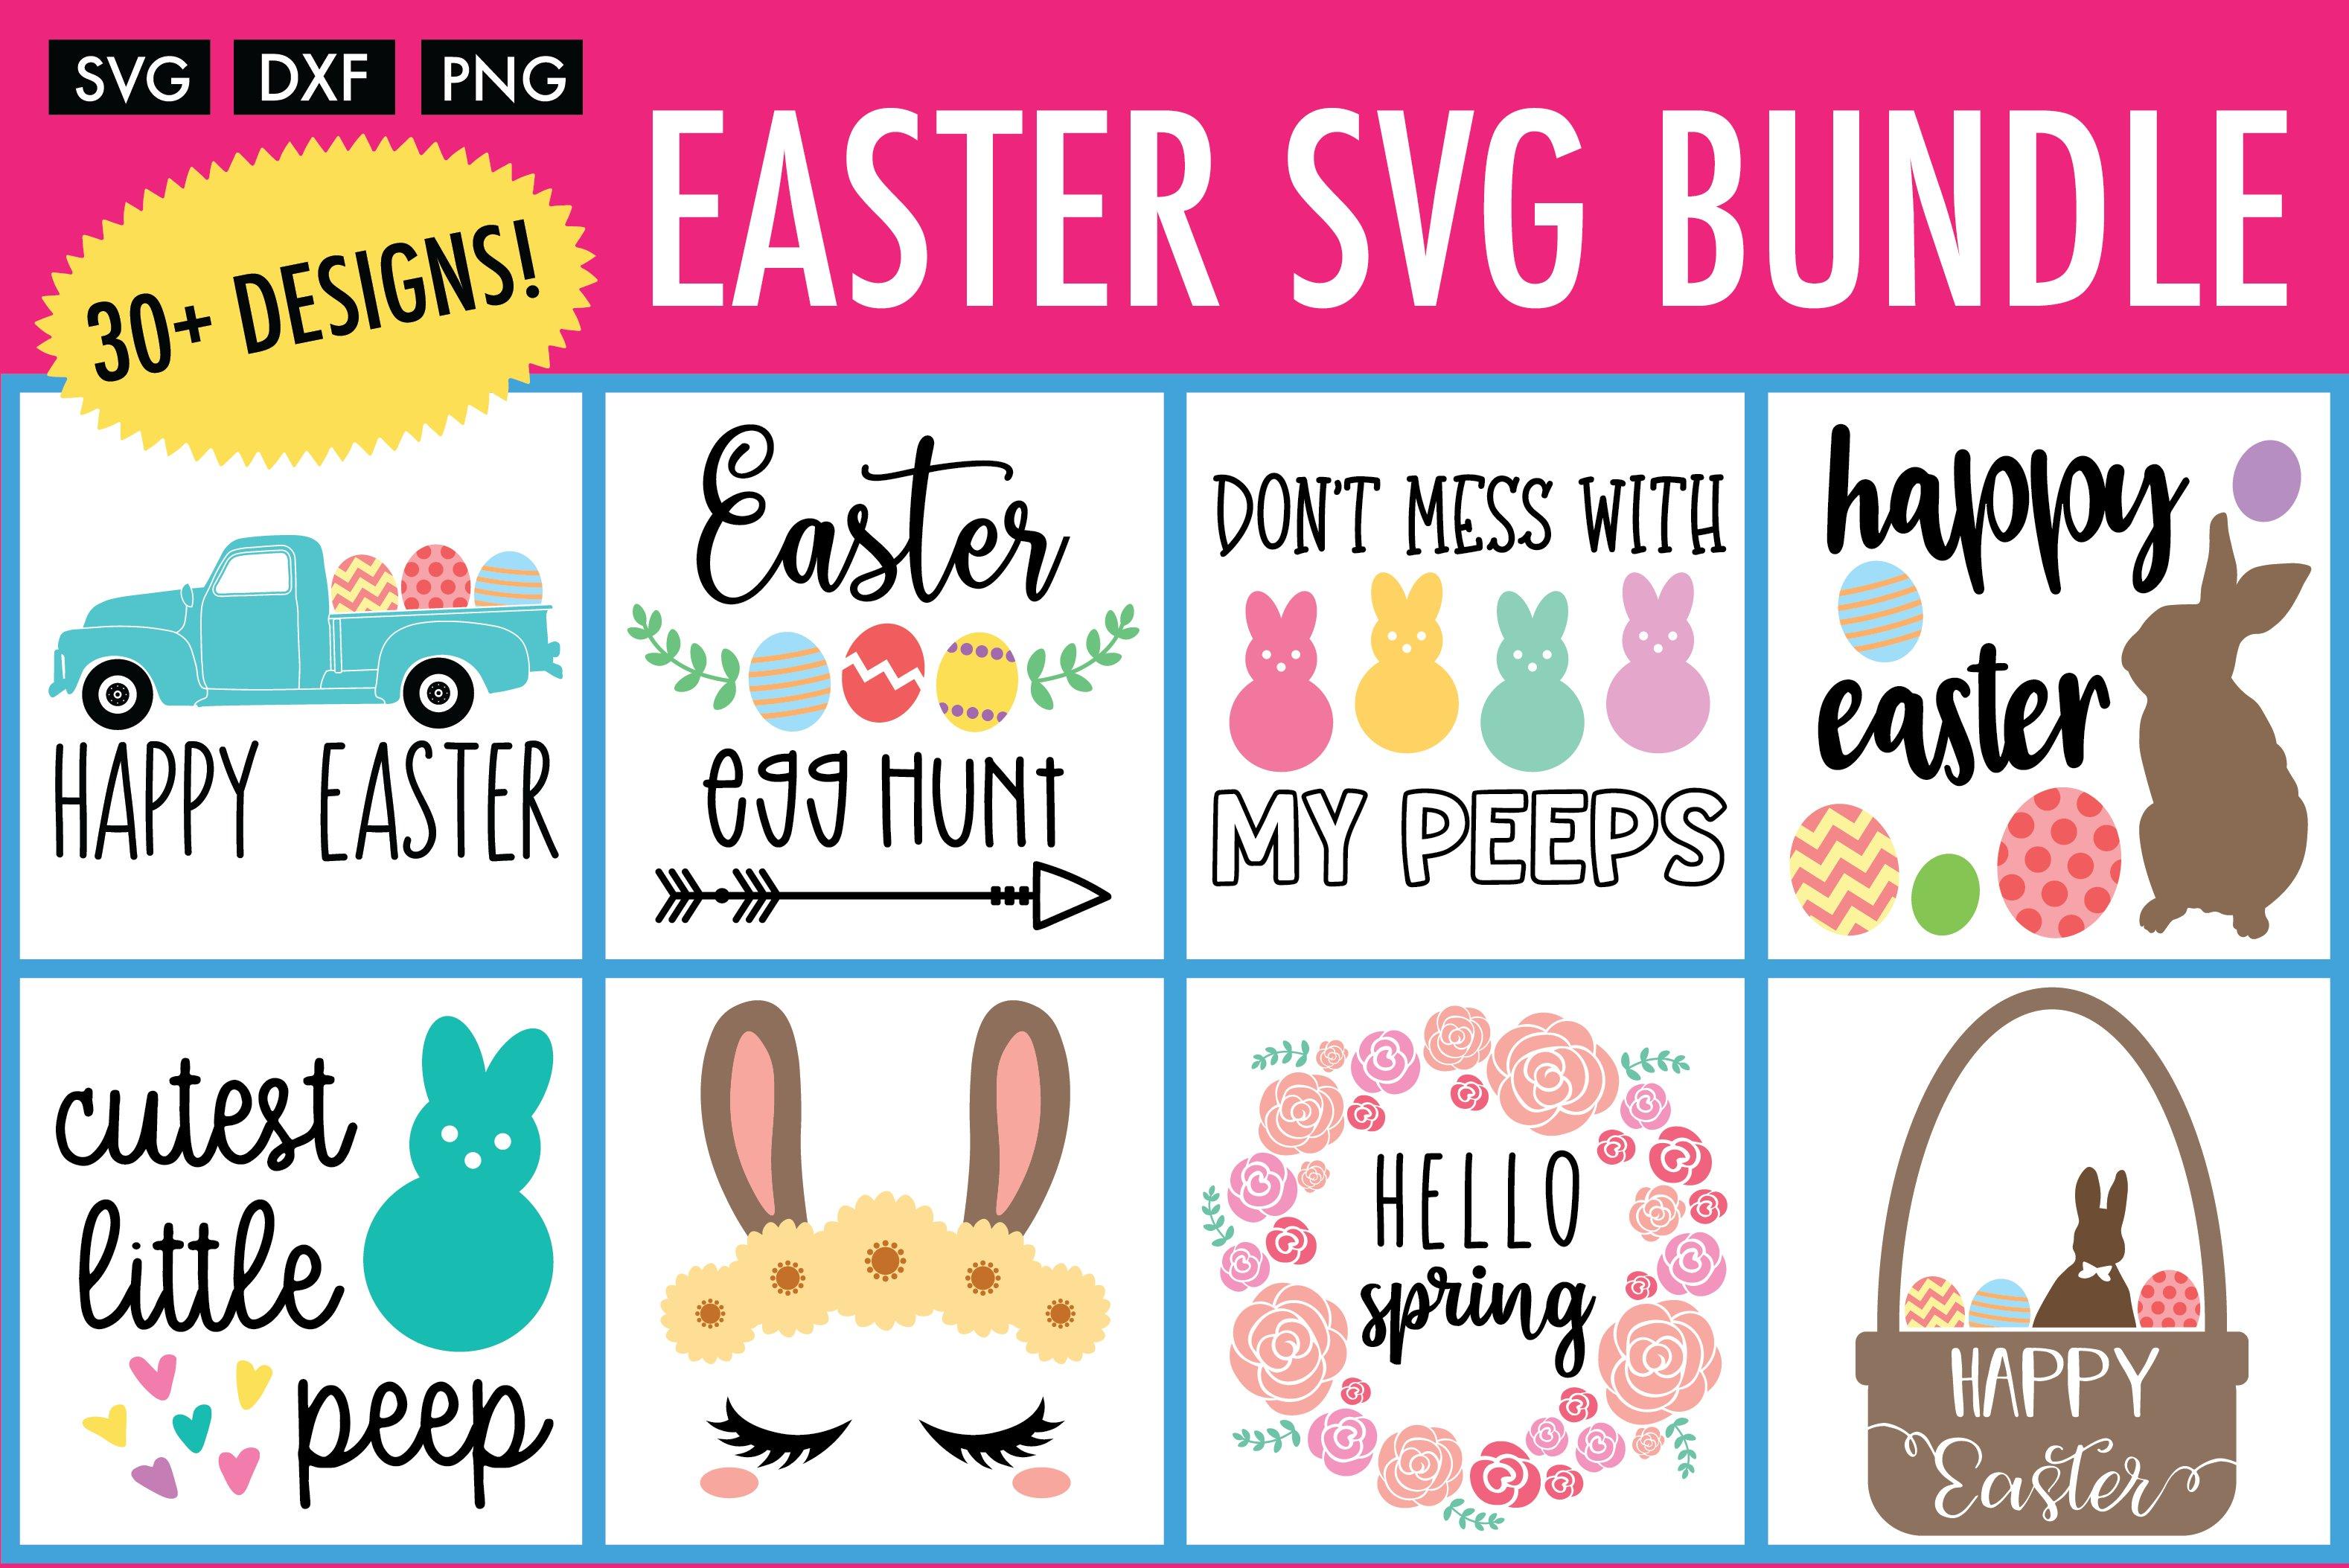 Easter Svg Bundle 32 Designs Pre Designed Photoshop Graphics Creative Market